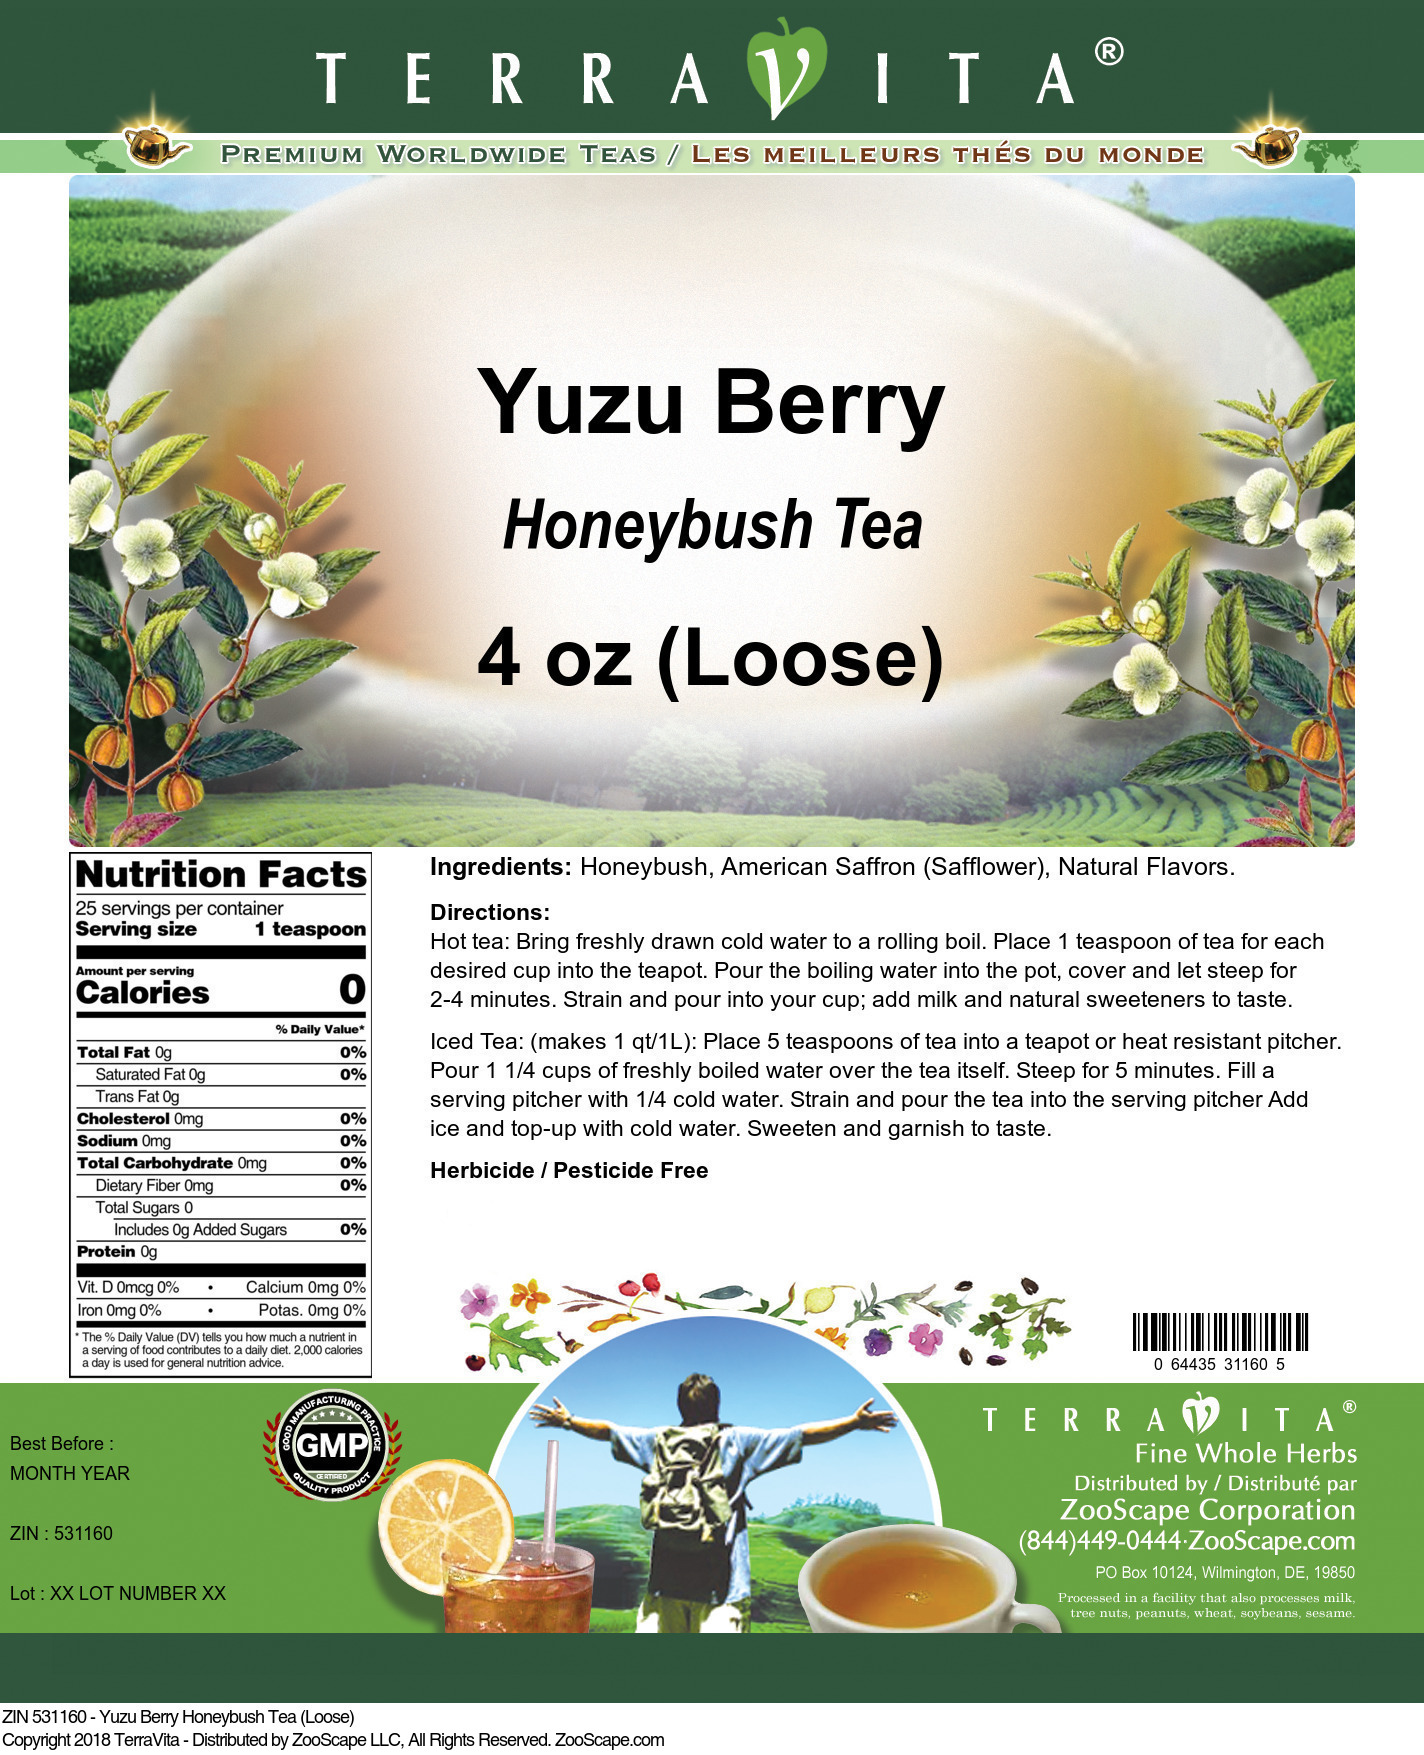 Yuzu Berry Honeybush Tea (Loose)